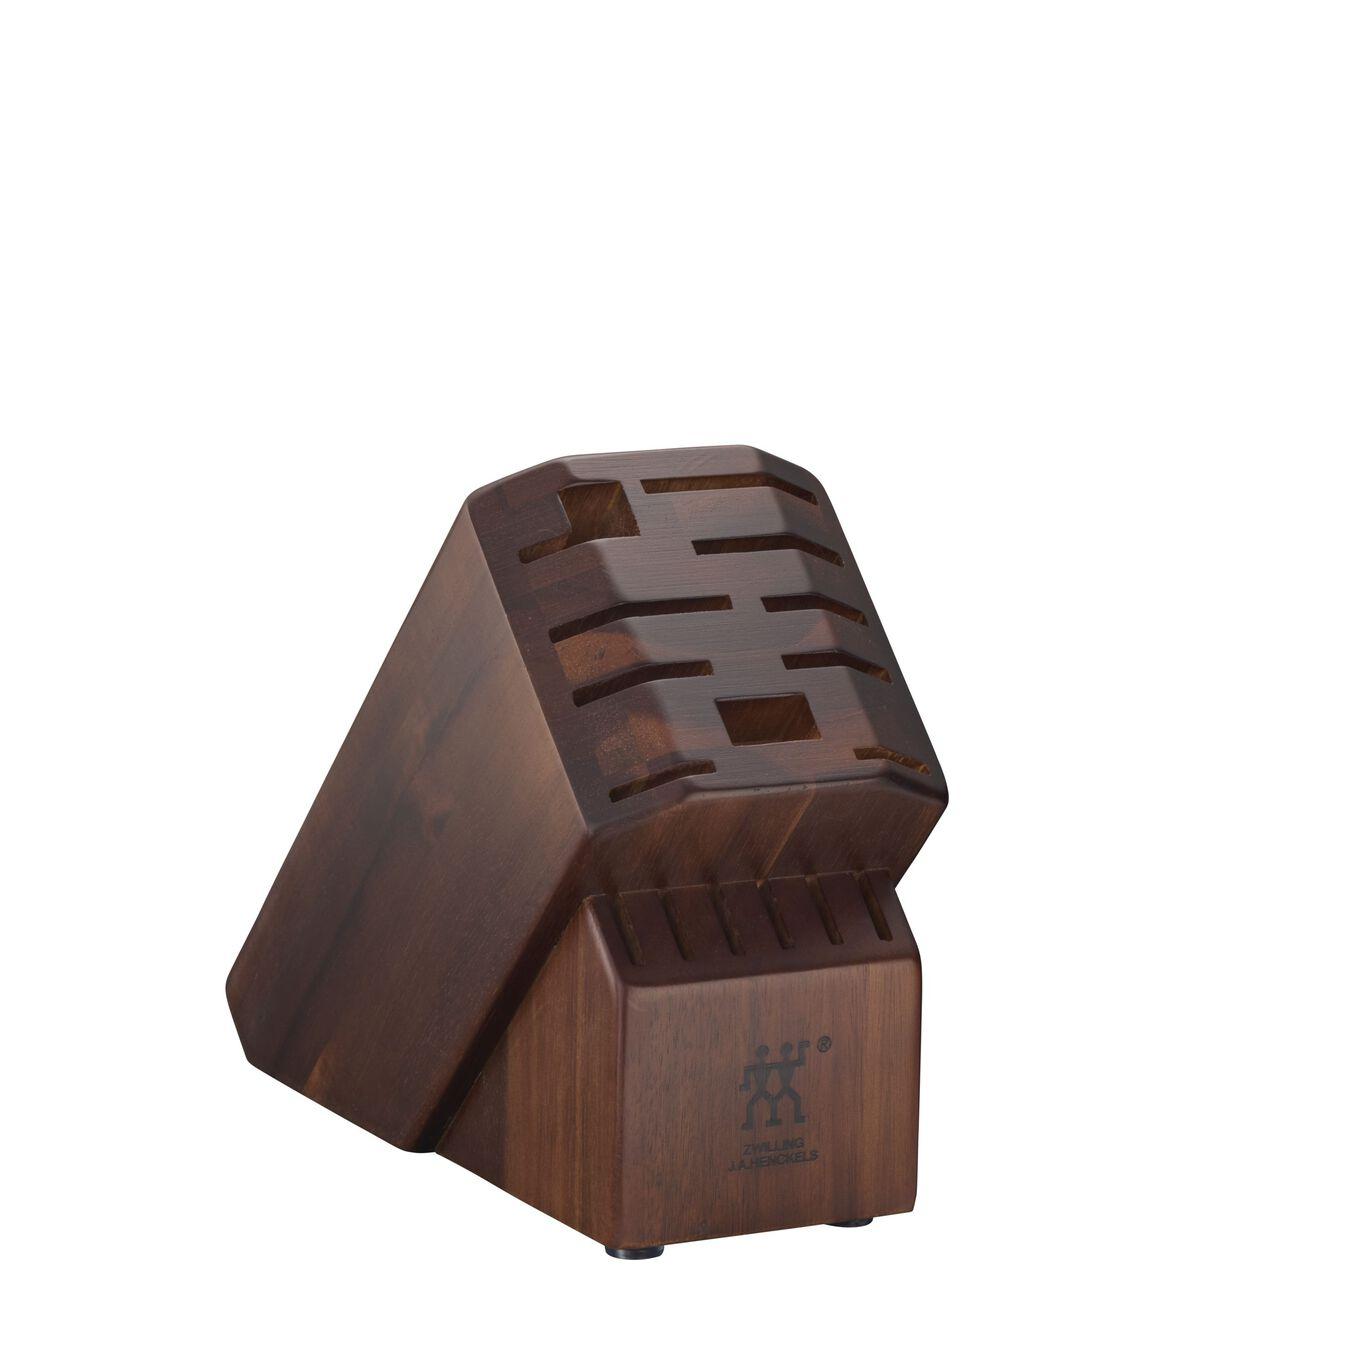 Acacia 16-slot block,,large 1